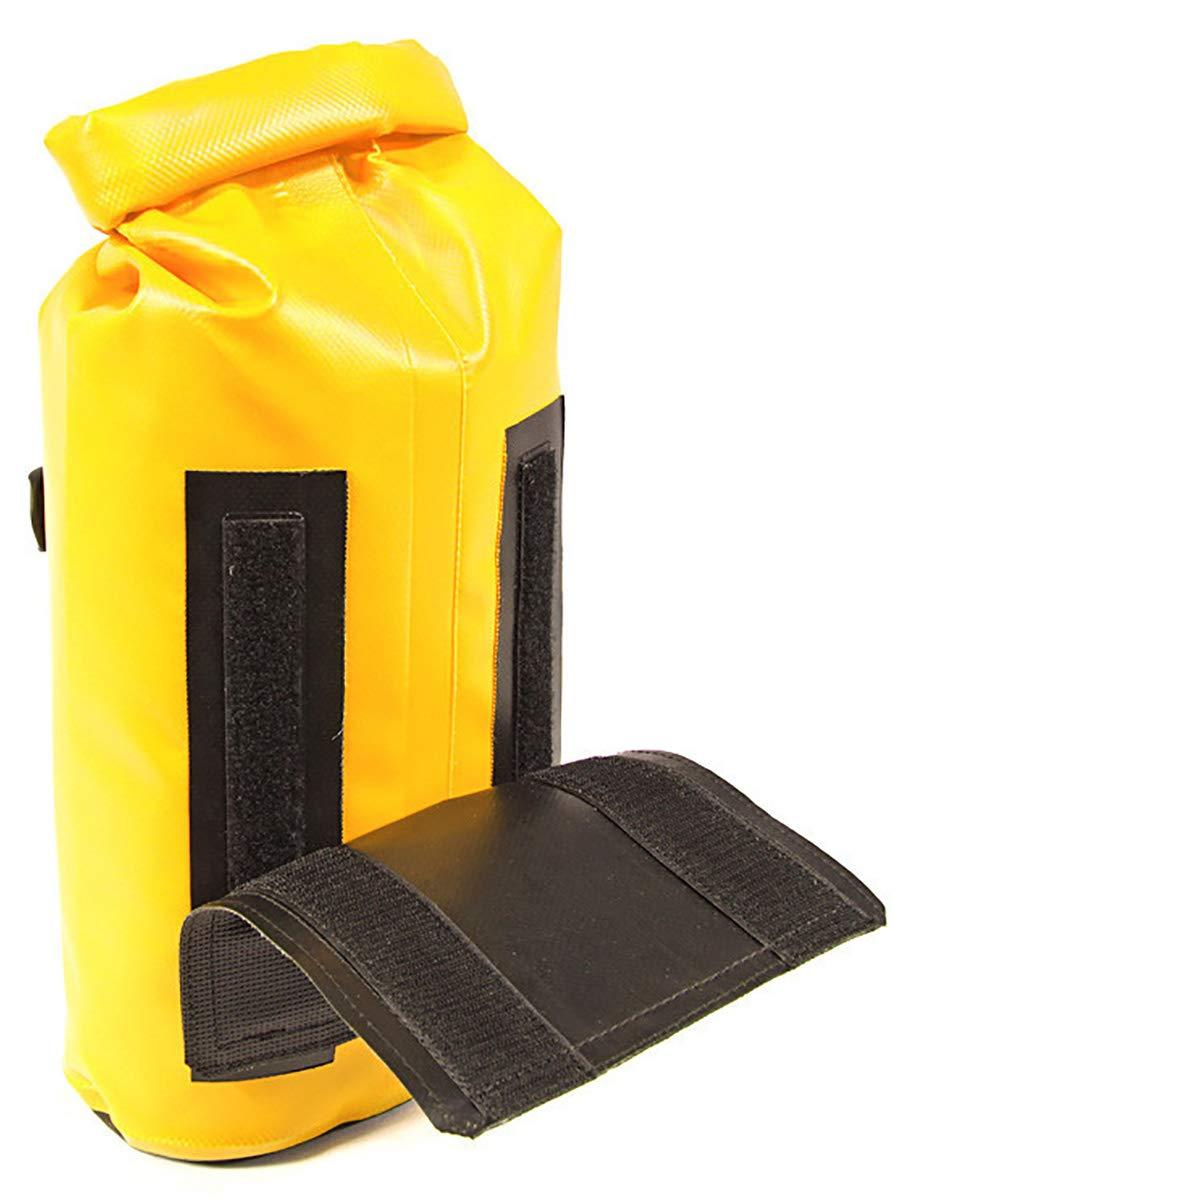 Small Wolfman Luggage/H101 Black Rolie Bag